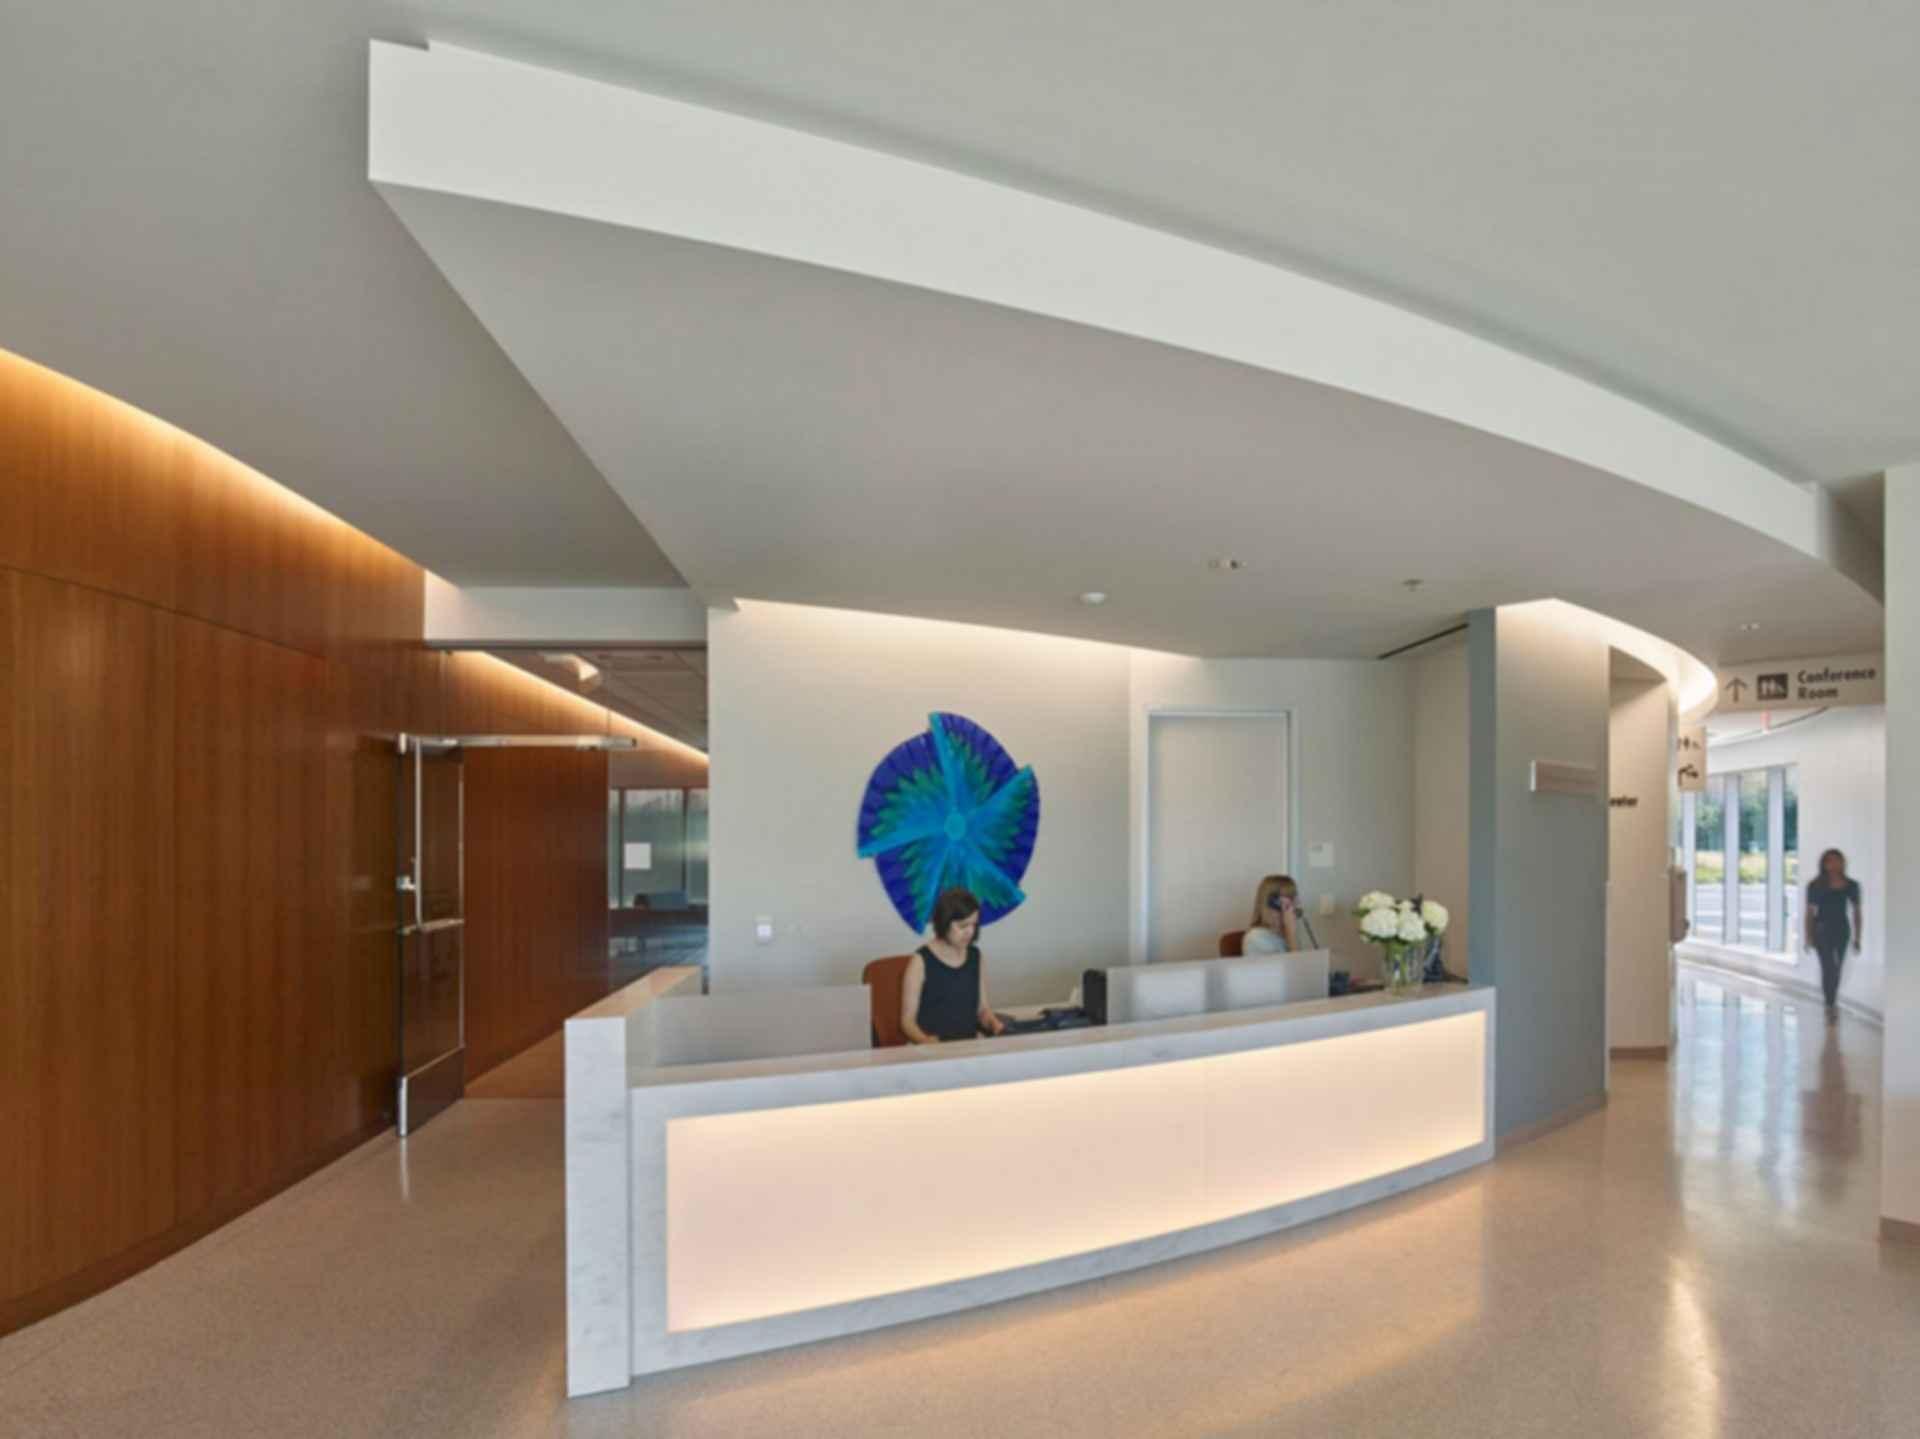 Kaiser Permanente Radiation Oncology Center - interior/reception